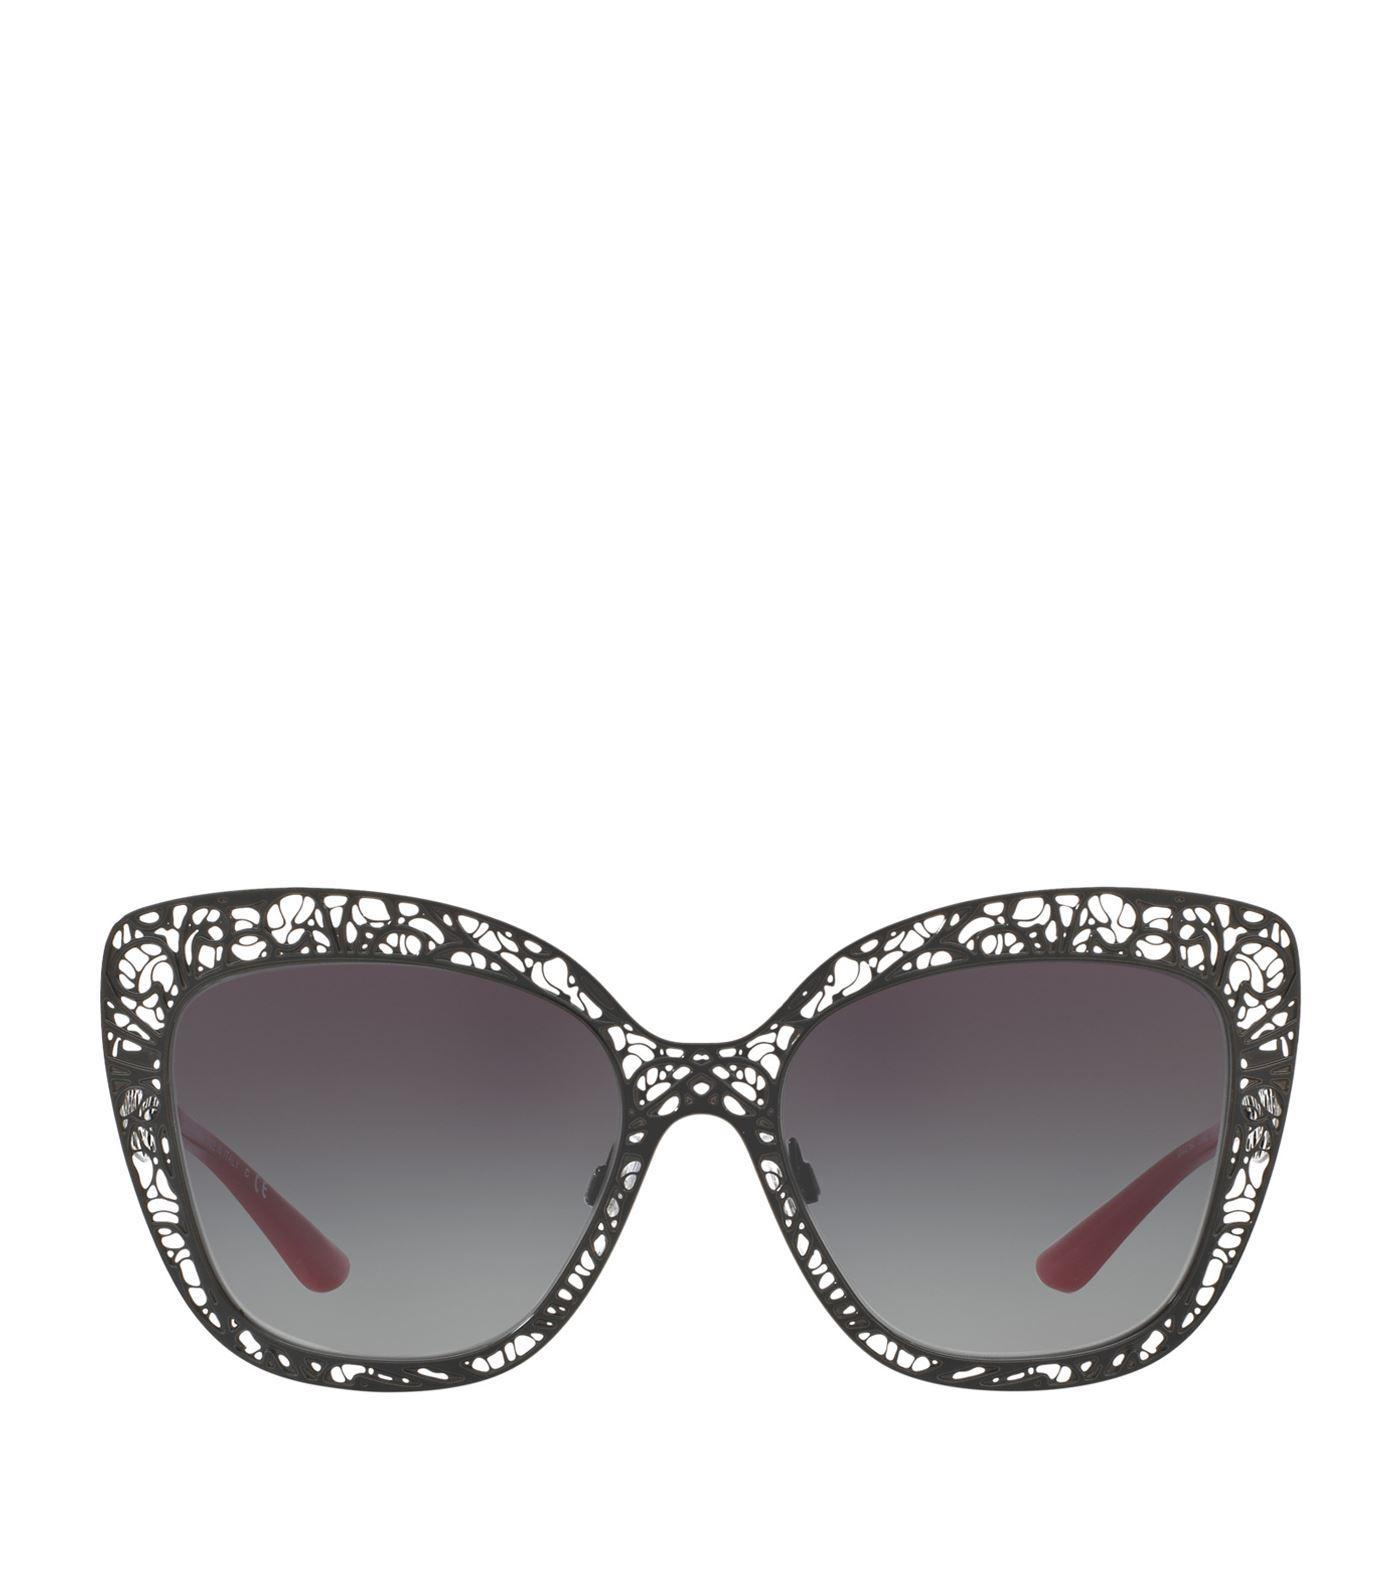 9d4717d9ccac Dolce   Gabbana Oversized Metal Frame Cat-Eye Sunglasses